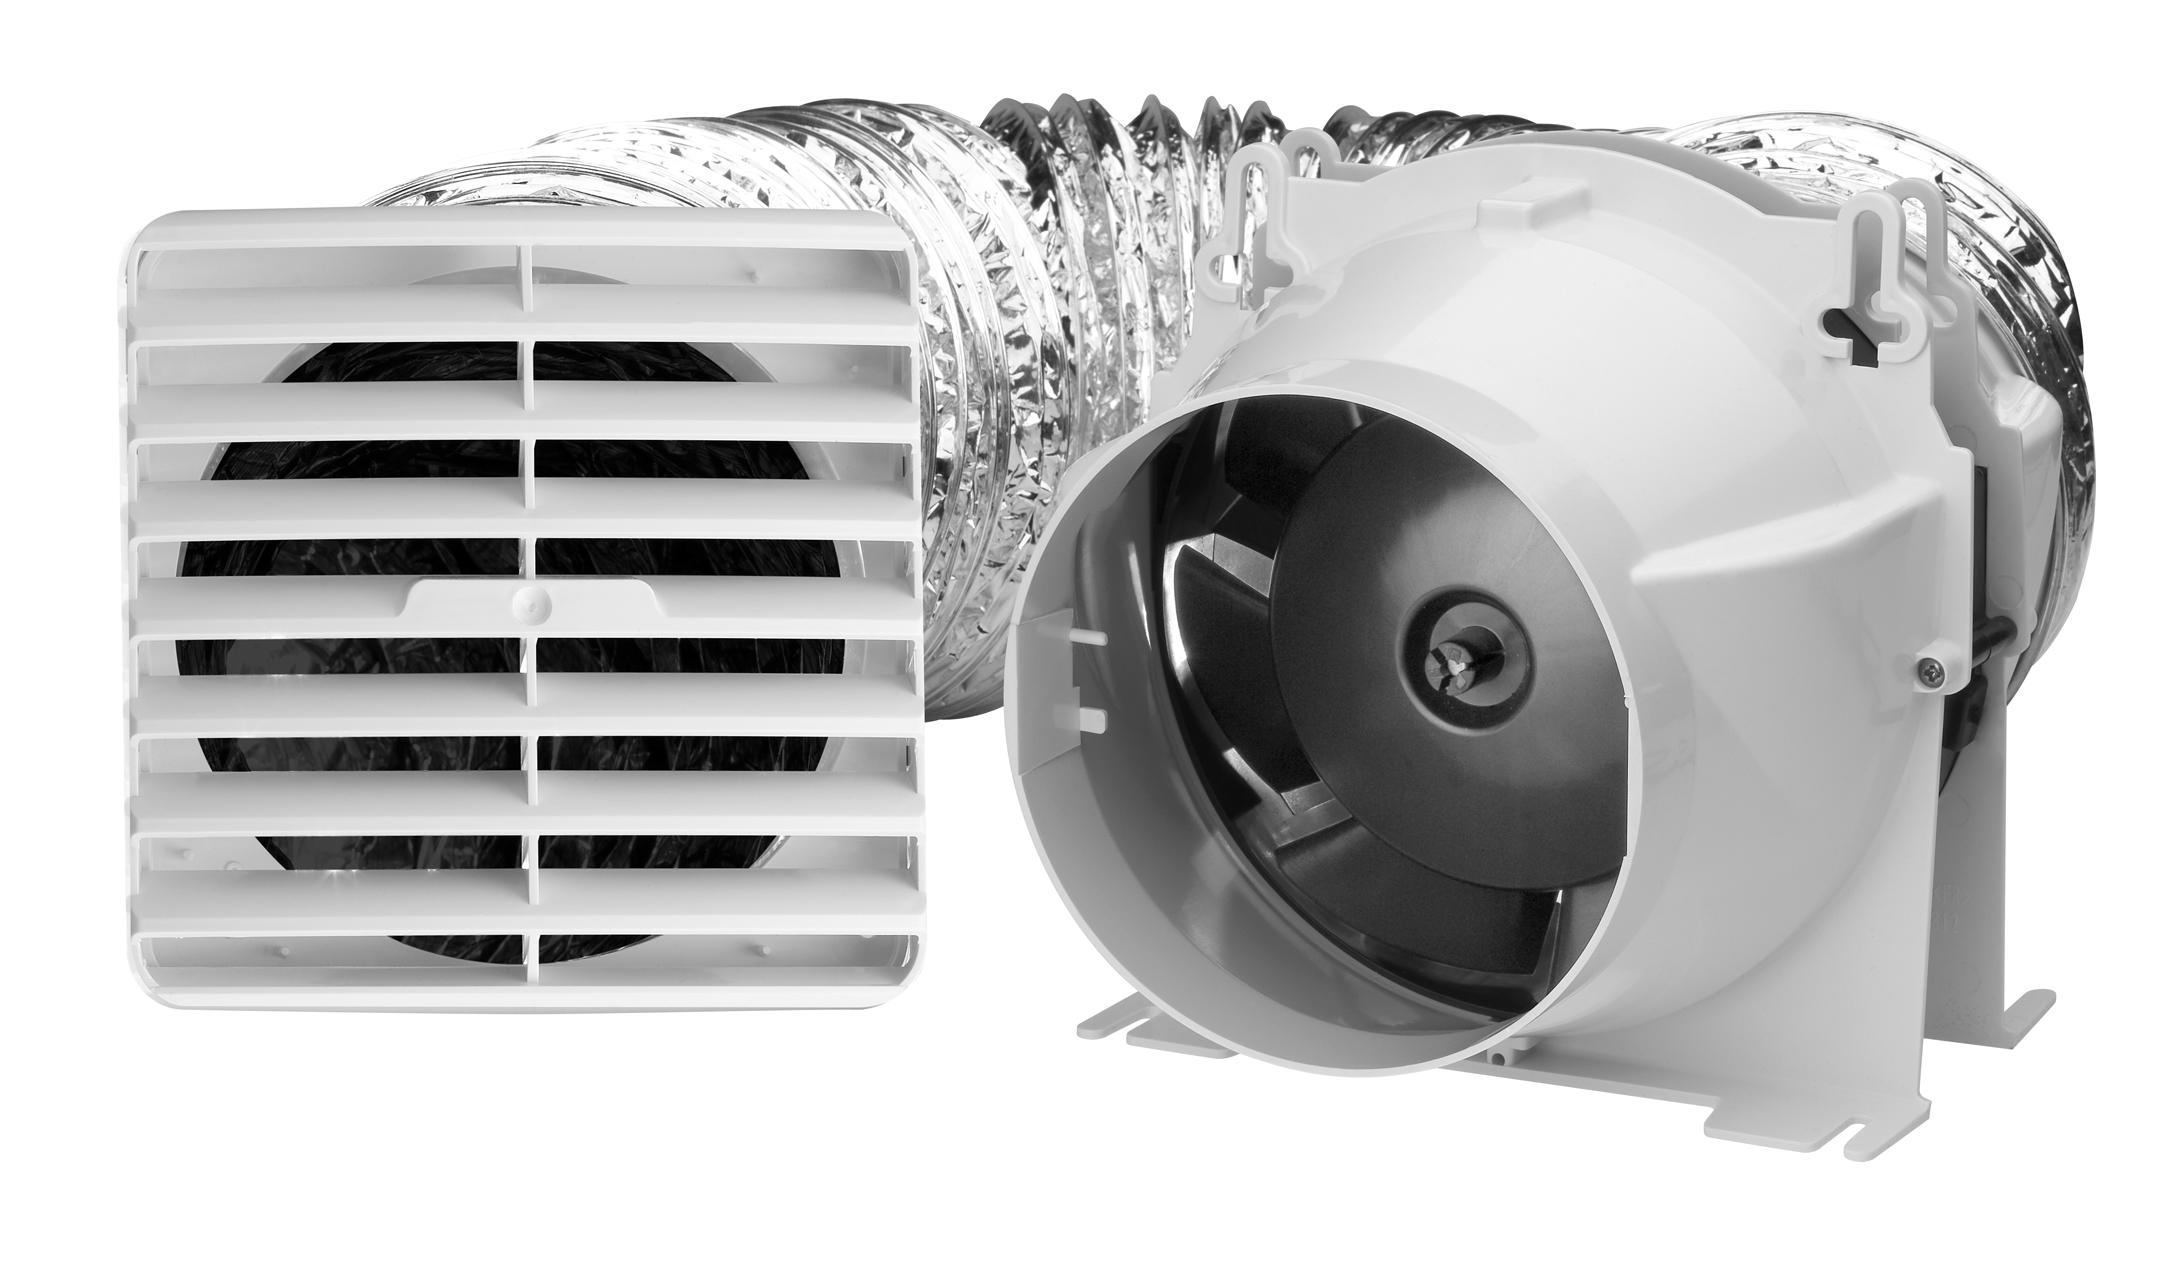 Ixl 39 S Premium Ventilation Systems The Kitchen And Bathroom Blog